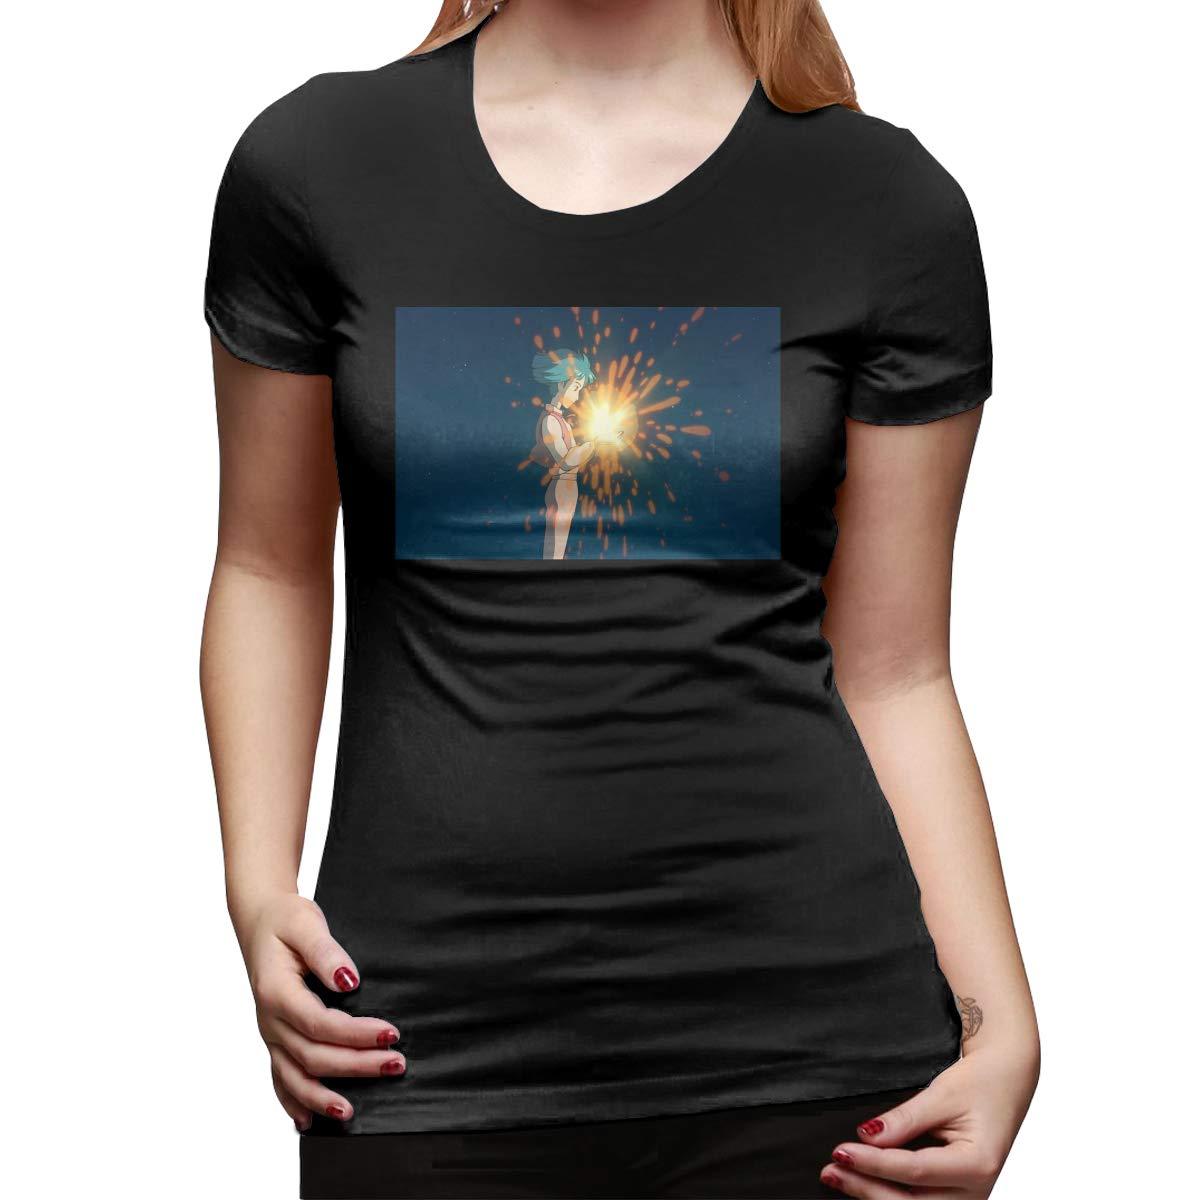 HEPPARD 2019 Howls Moving Castle Movie Scene Tee Black Short-Sleeve Tshirts for Women Summer